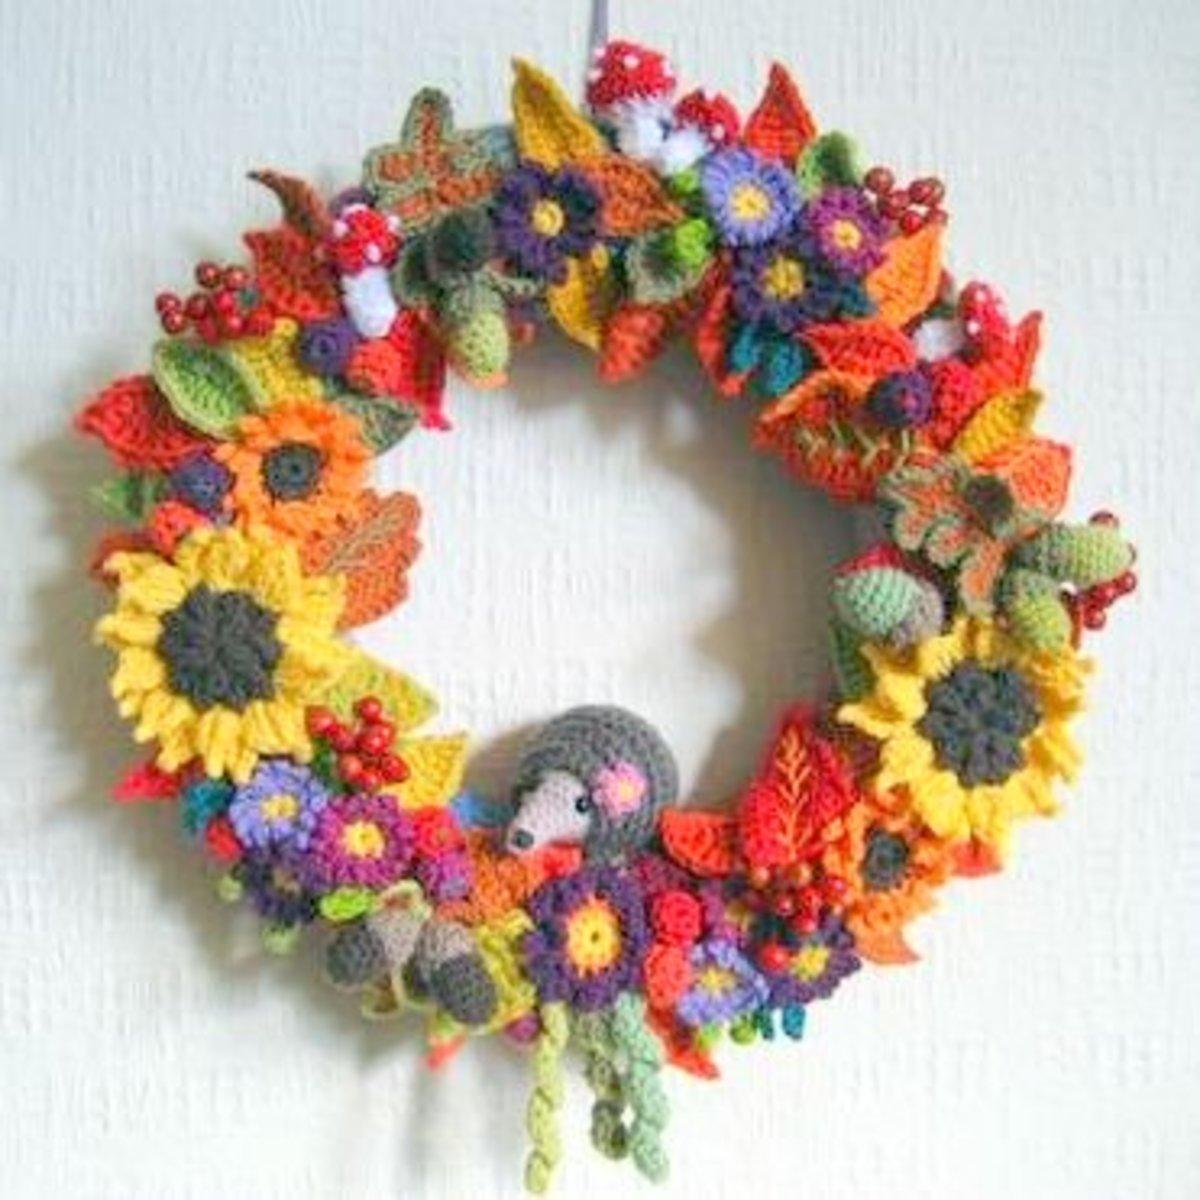 12 Free Fall & Thanksgiving Wreaths Crochet Patterns ...